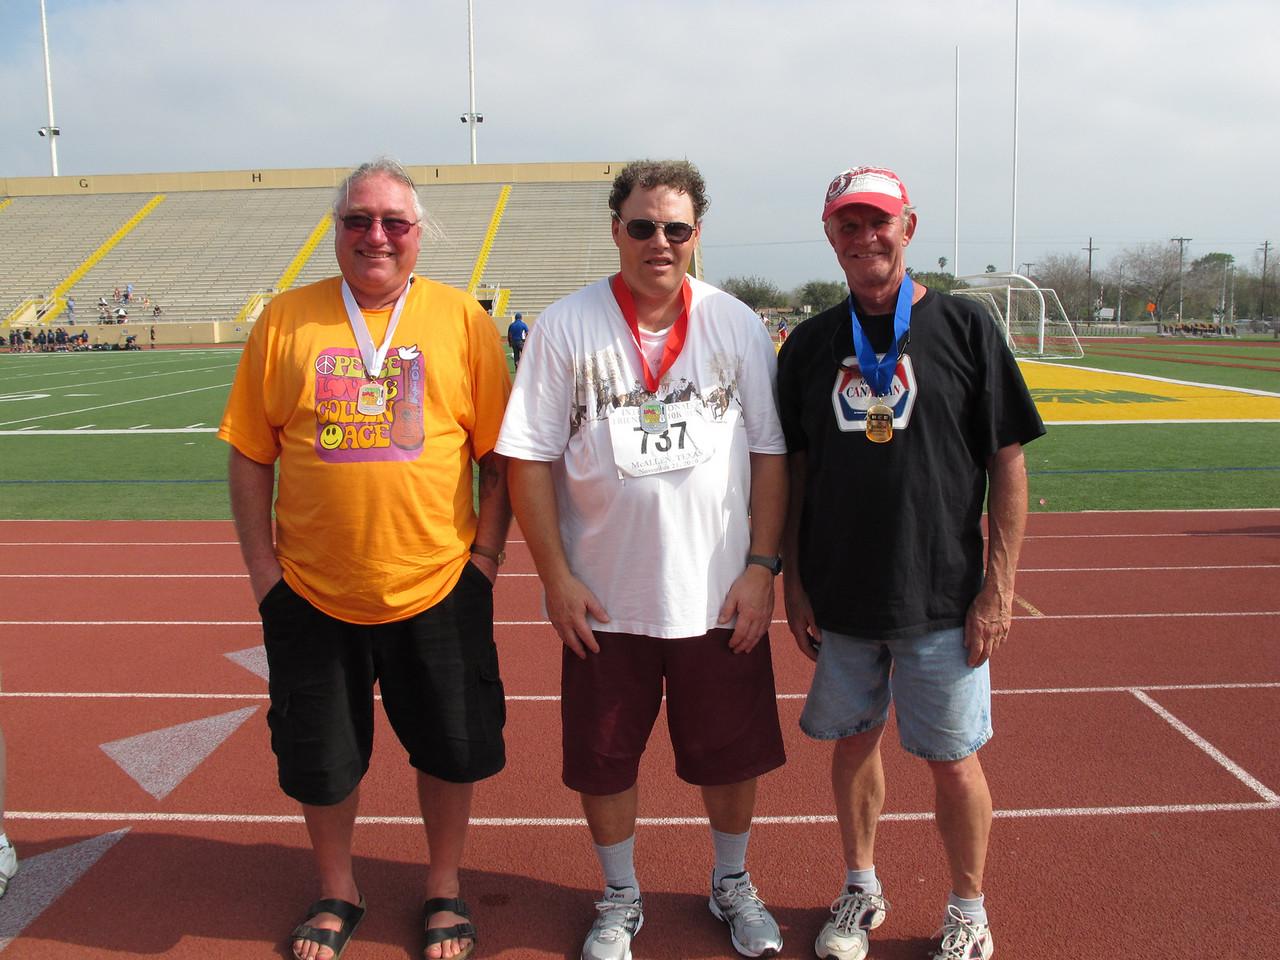 Racewalk Men 50-59 (L-R) 3rd Place - Bernard Steger (Snow to Sun), 2nd Place - Randy Boyer (Tropic Star), 1st Place - David Howard (Bit O Heaven)